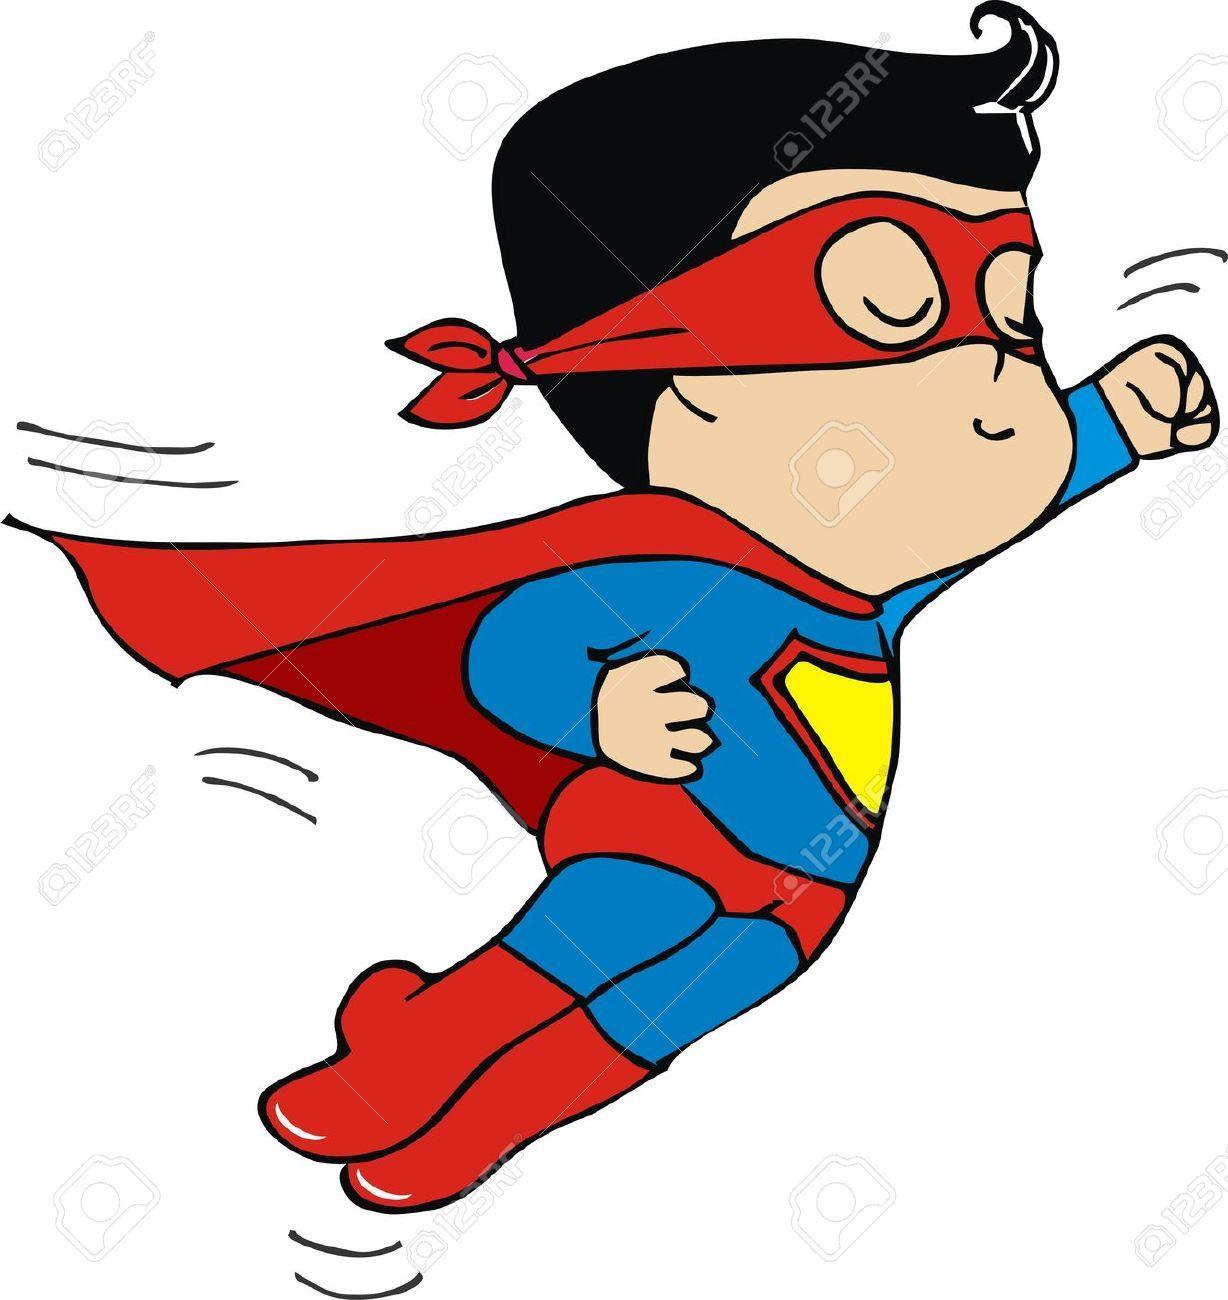 1228x1300 Superman%20clipart Planner Clip Art, Planners